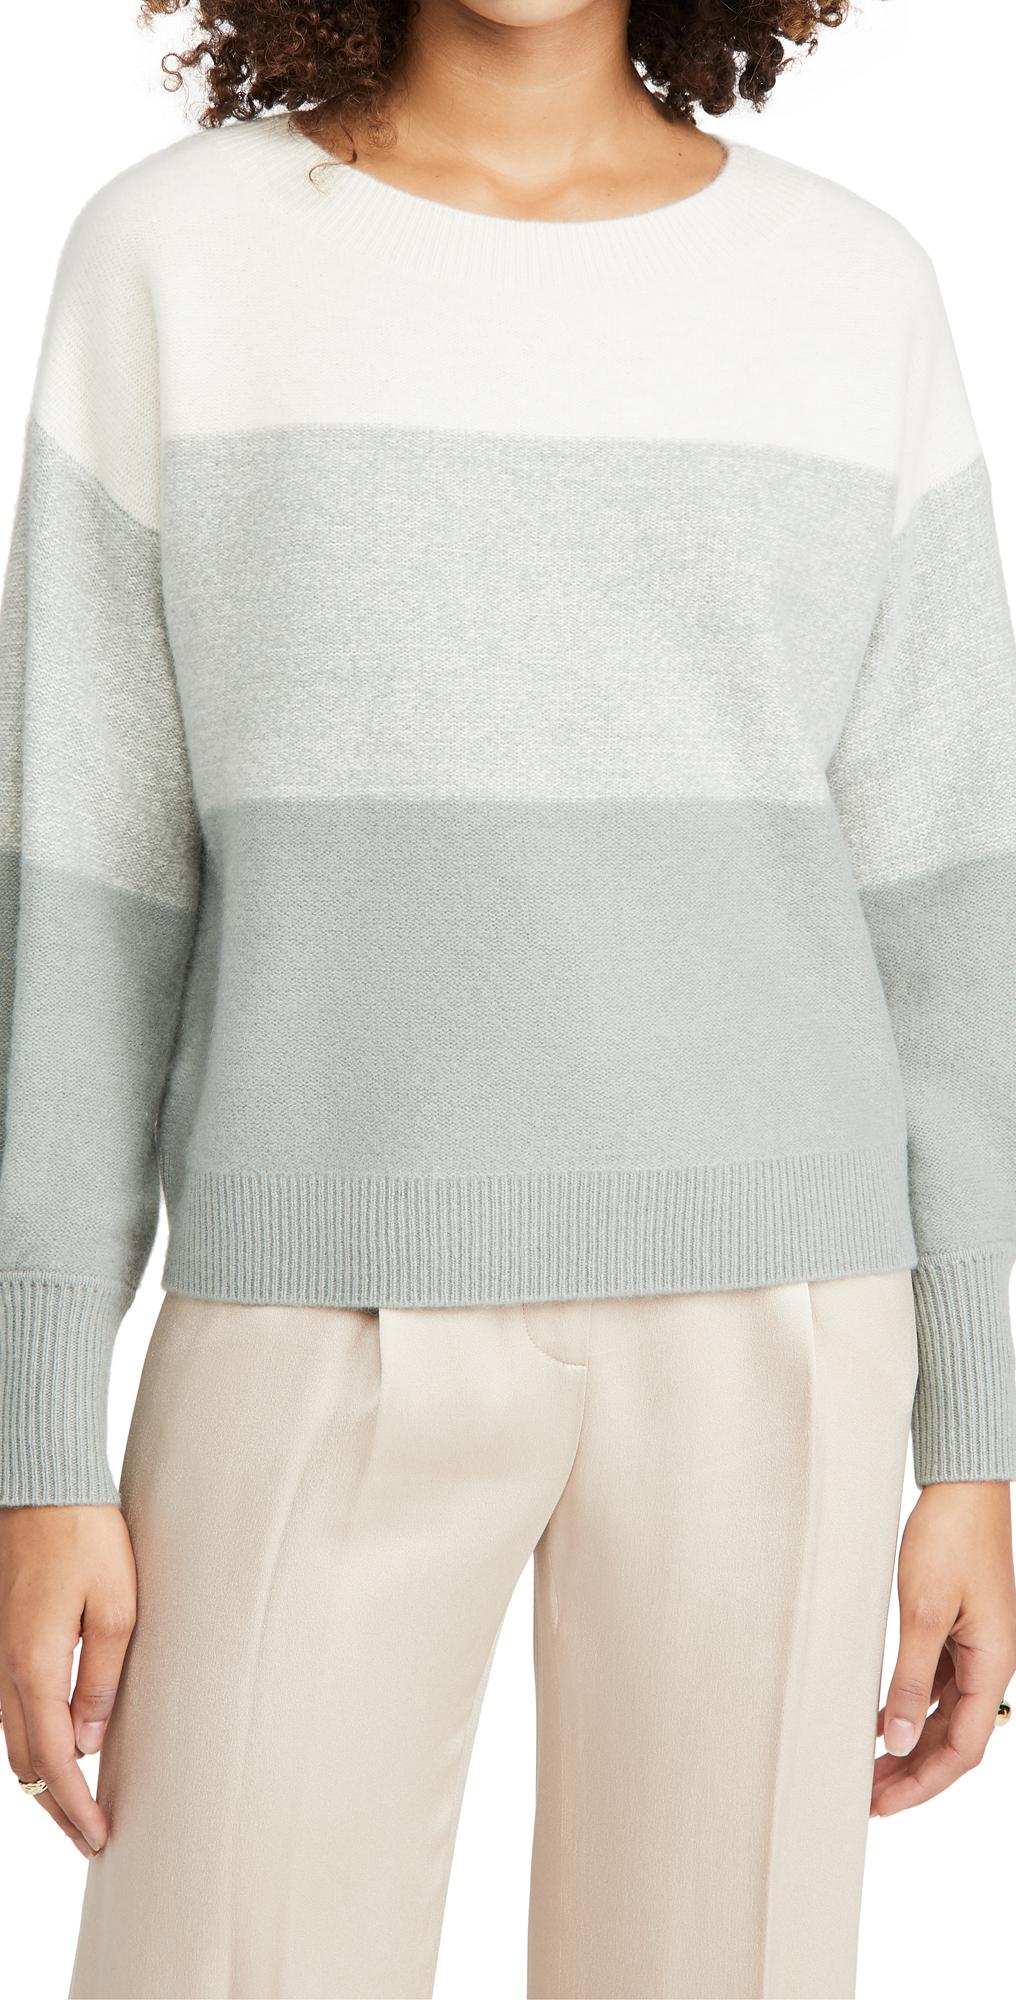 Club Monaco Boiled Boatneck Cashmere Sweater